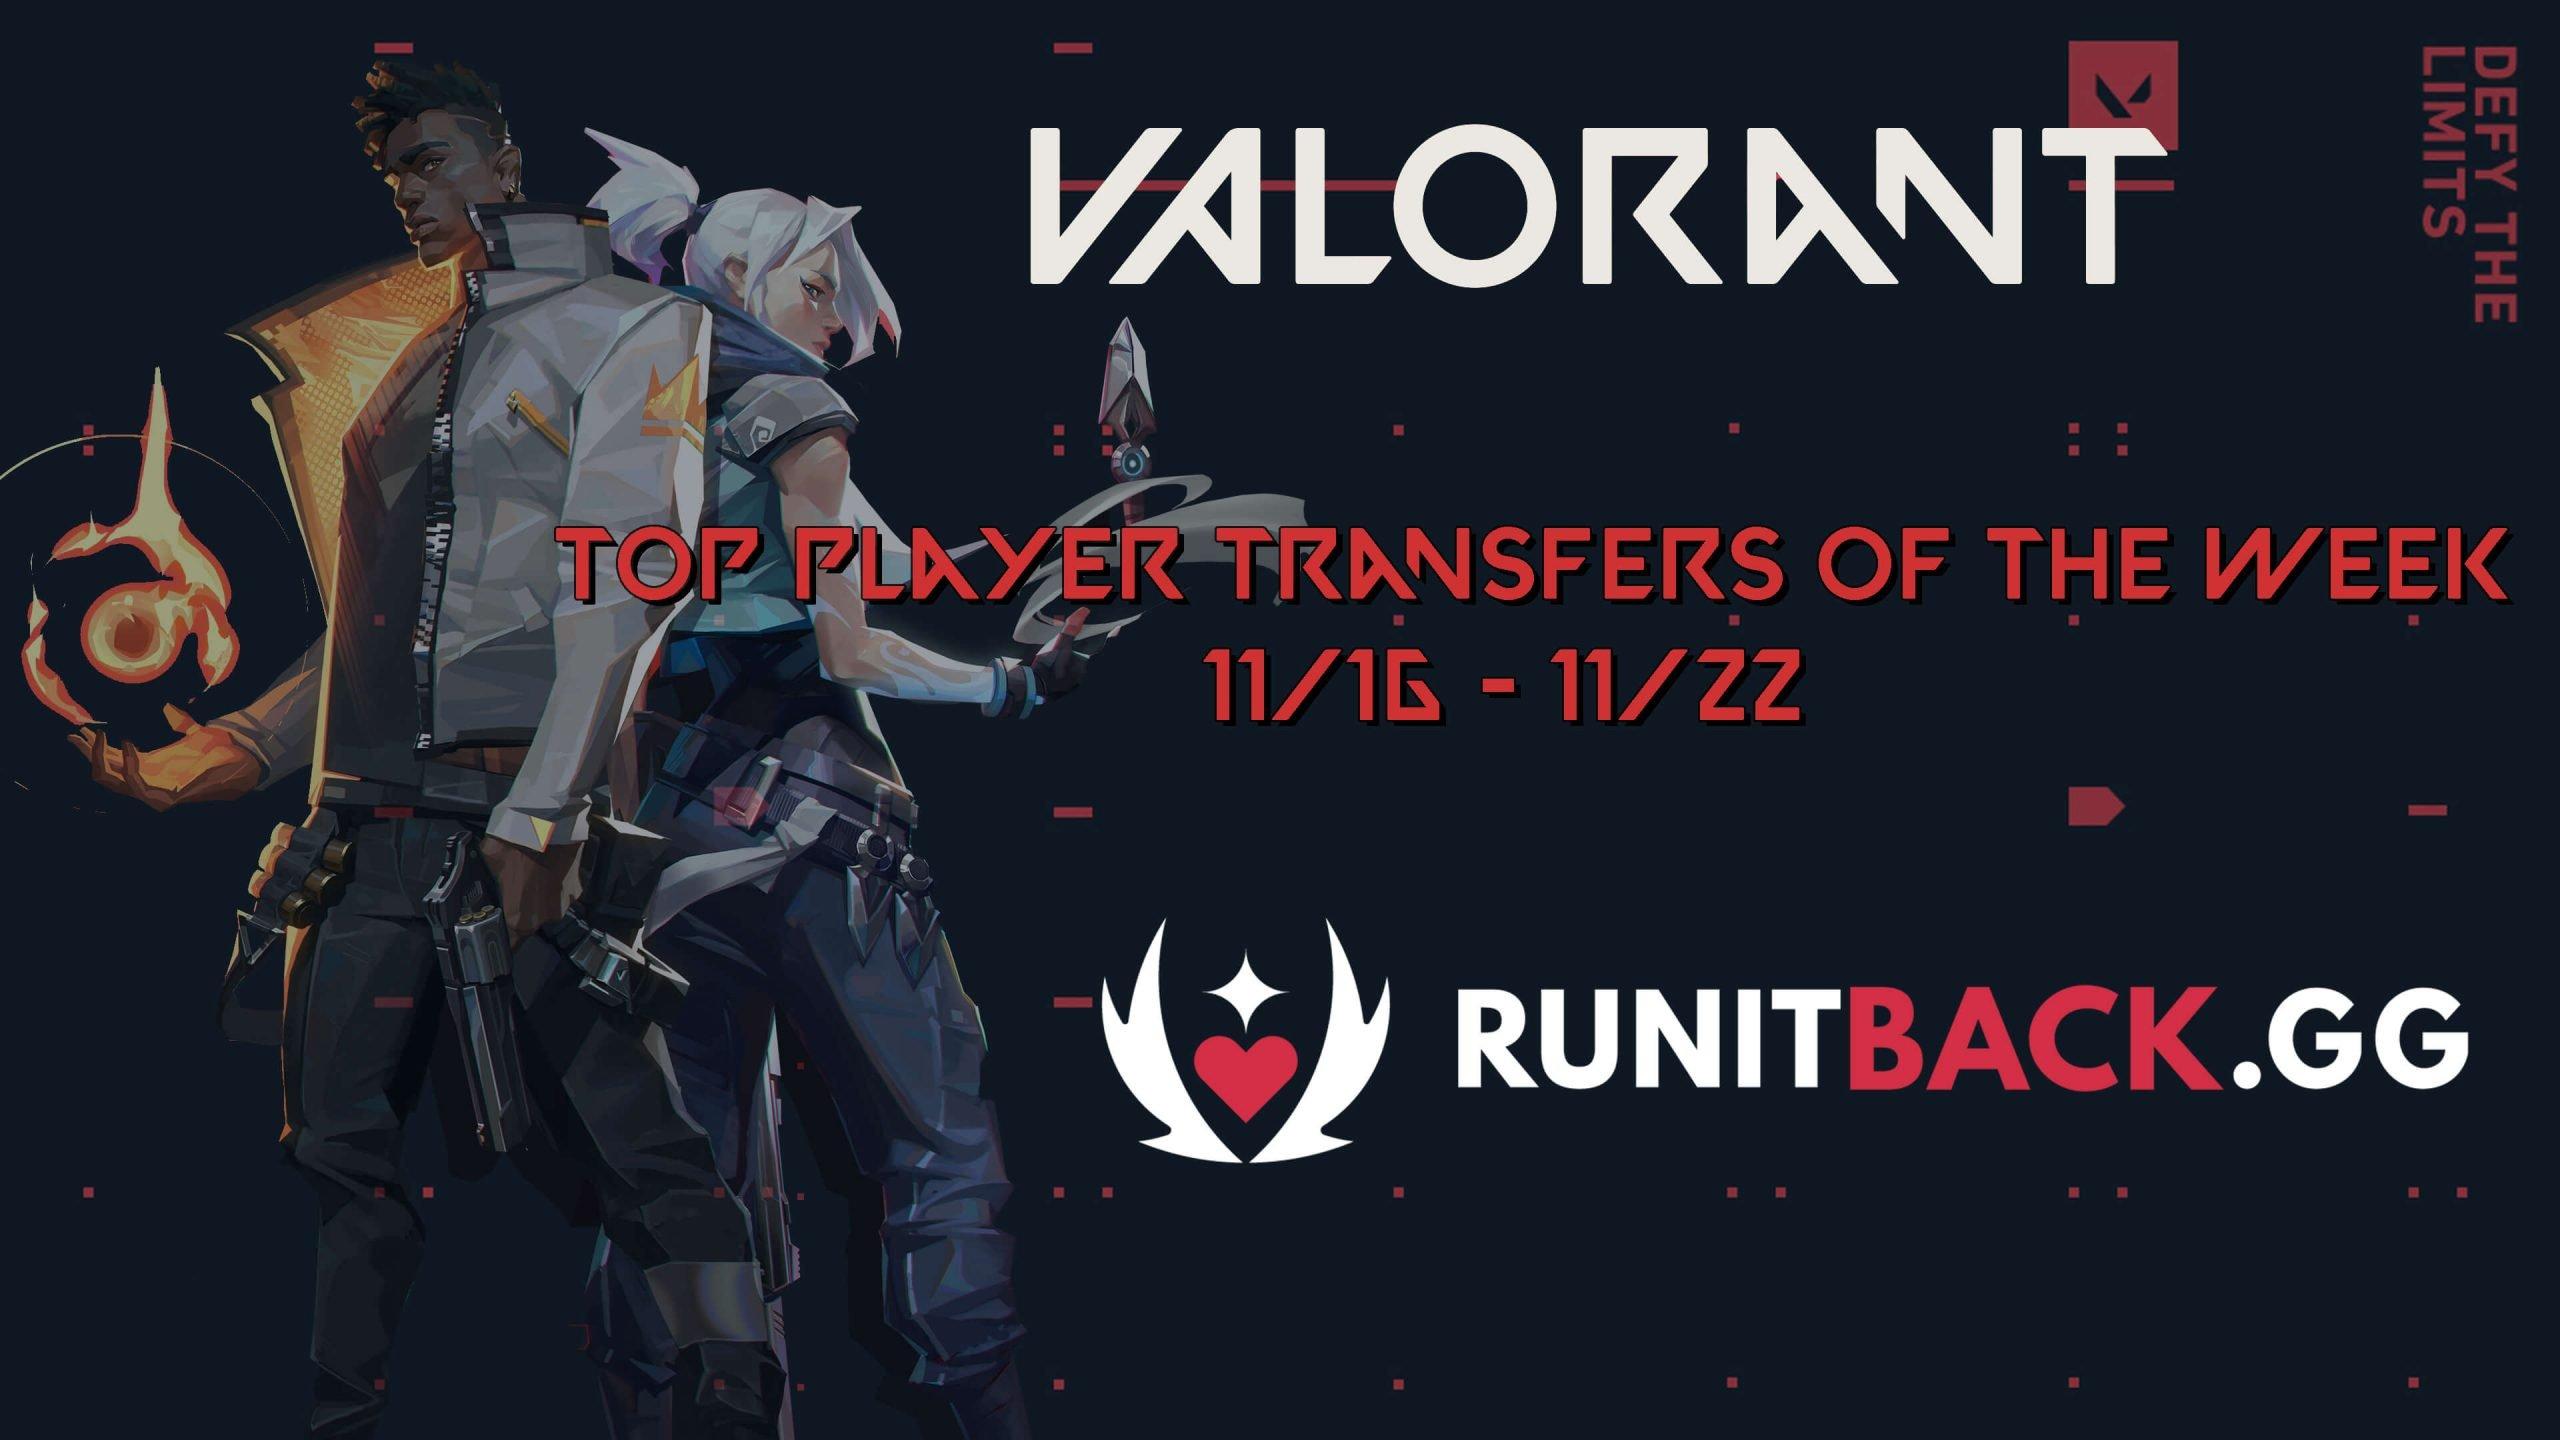 Top Player Transfers of the Week: November 16 – November 22